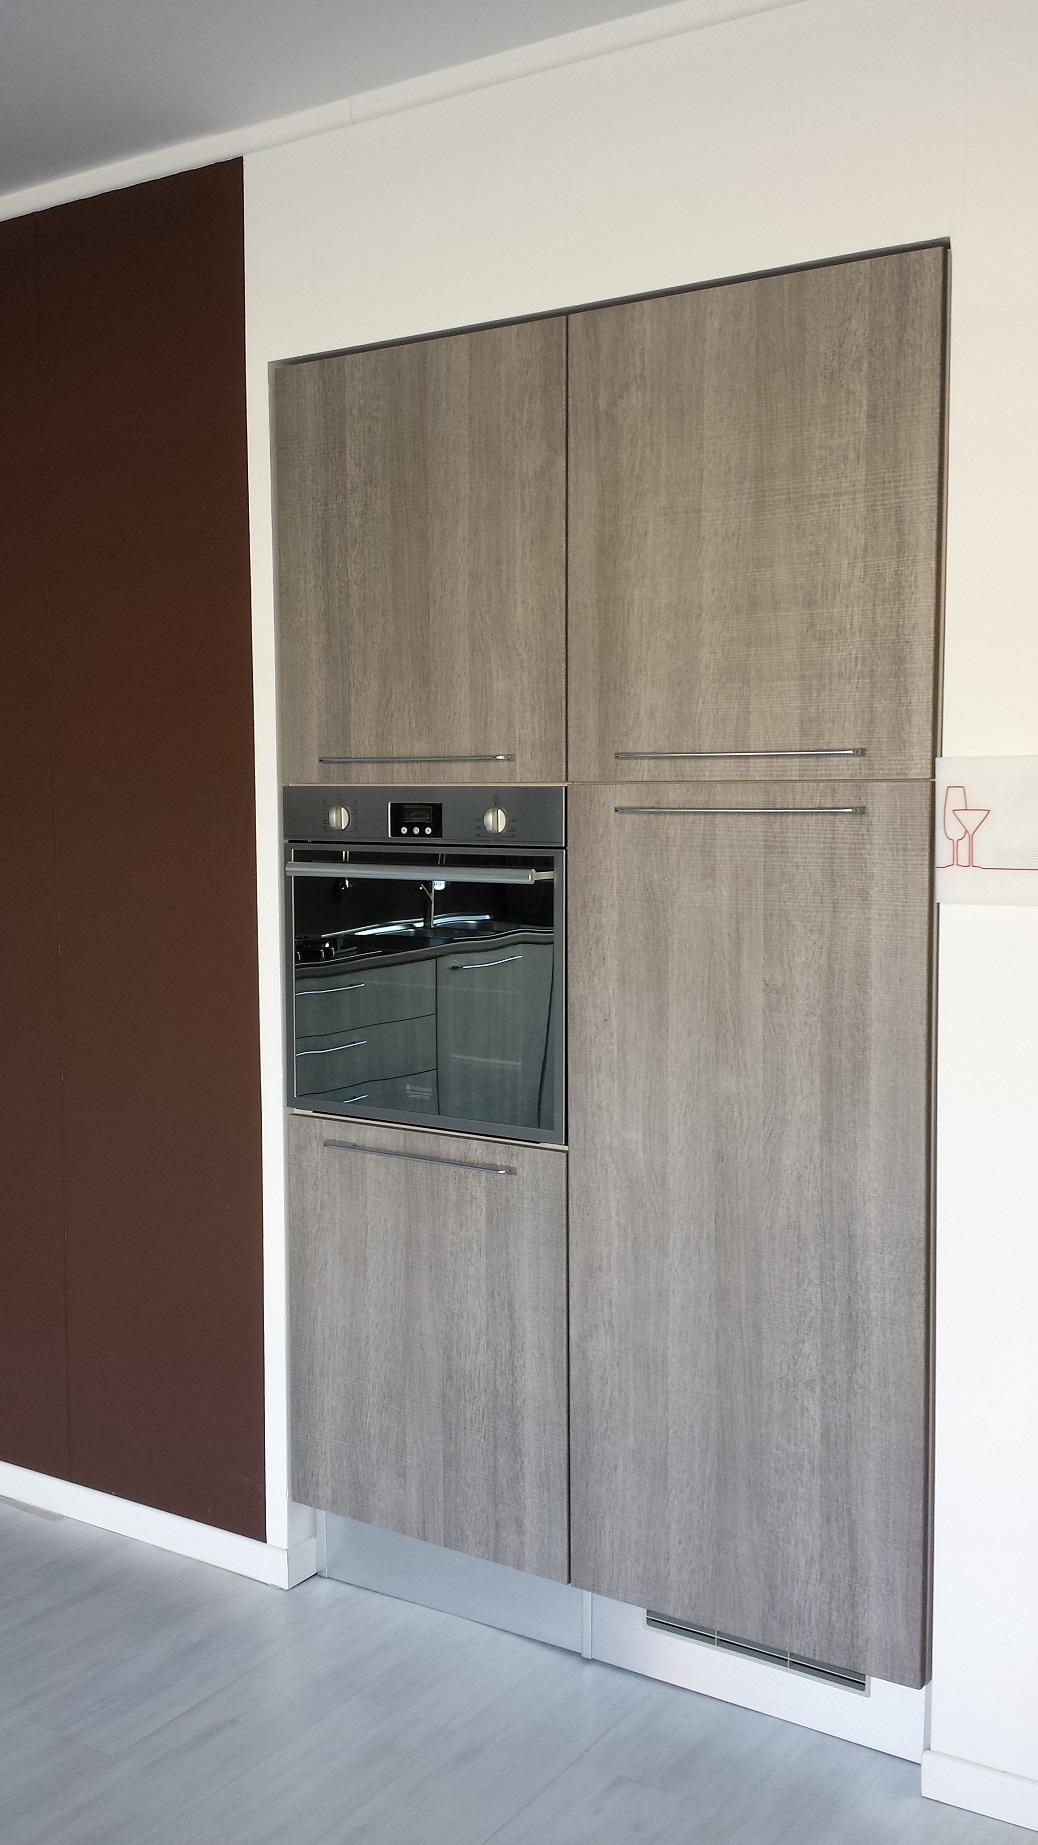 Cucina Lube Noemi : Lube cucine cucina noemi moderno laminato opaco a